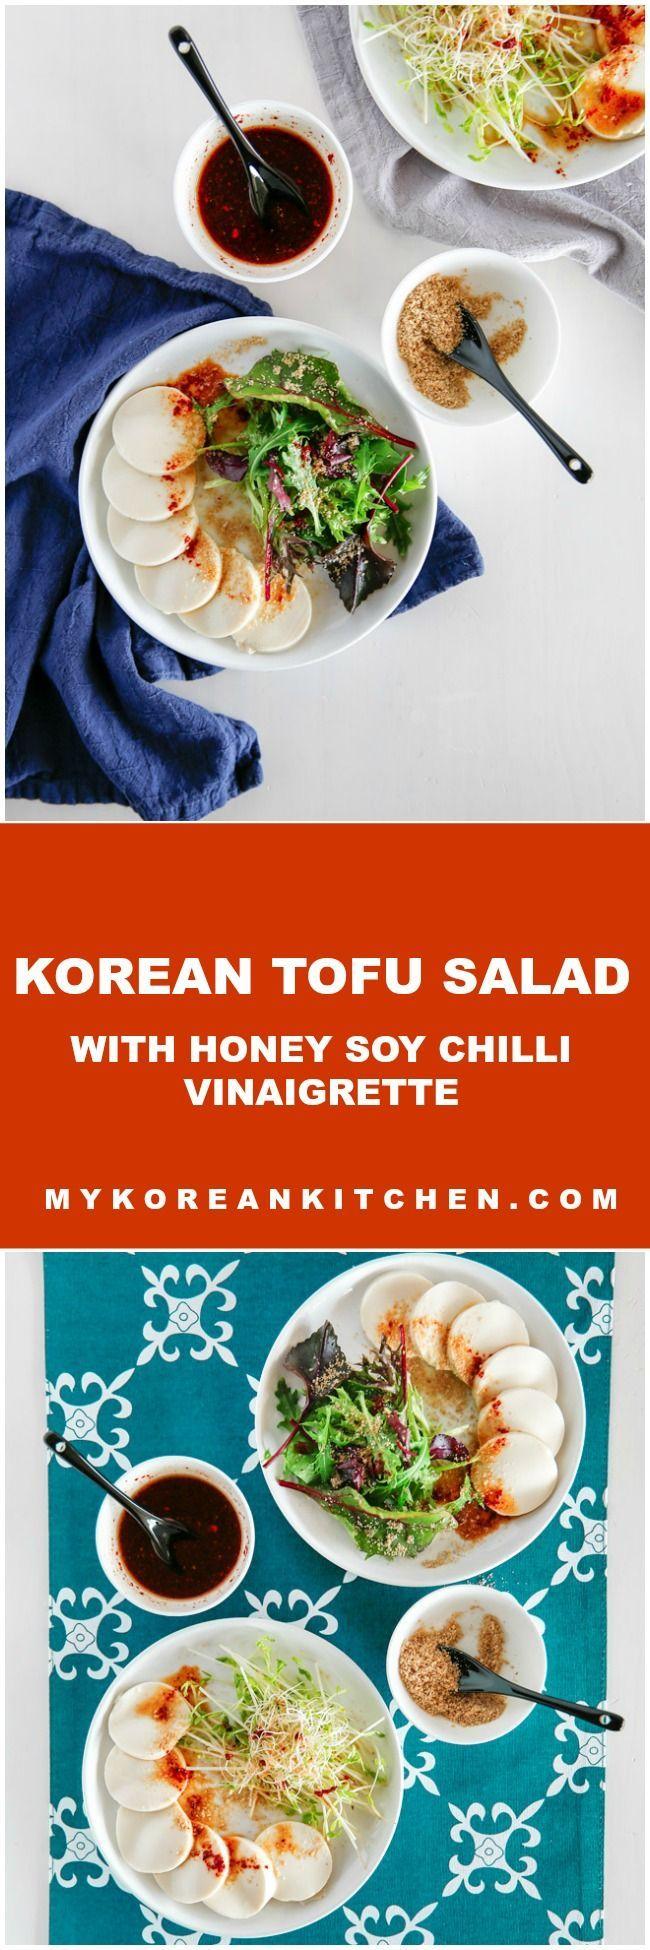 153 best korean food recipes images on pinterest korean food korean tofu salad with honey soy chilli vinaigrette forumfinder Images